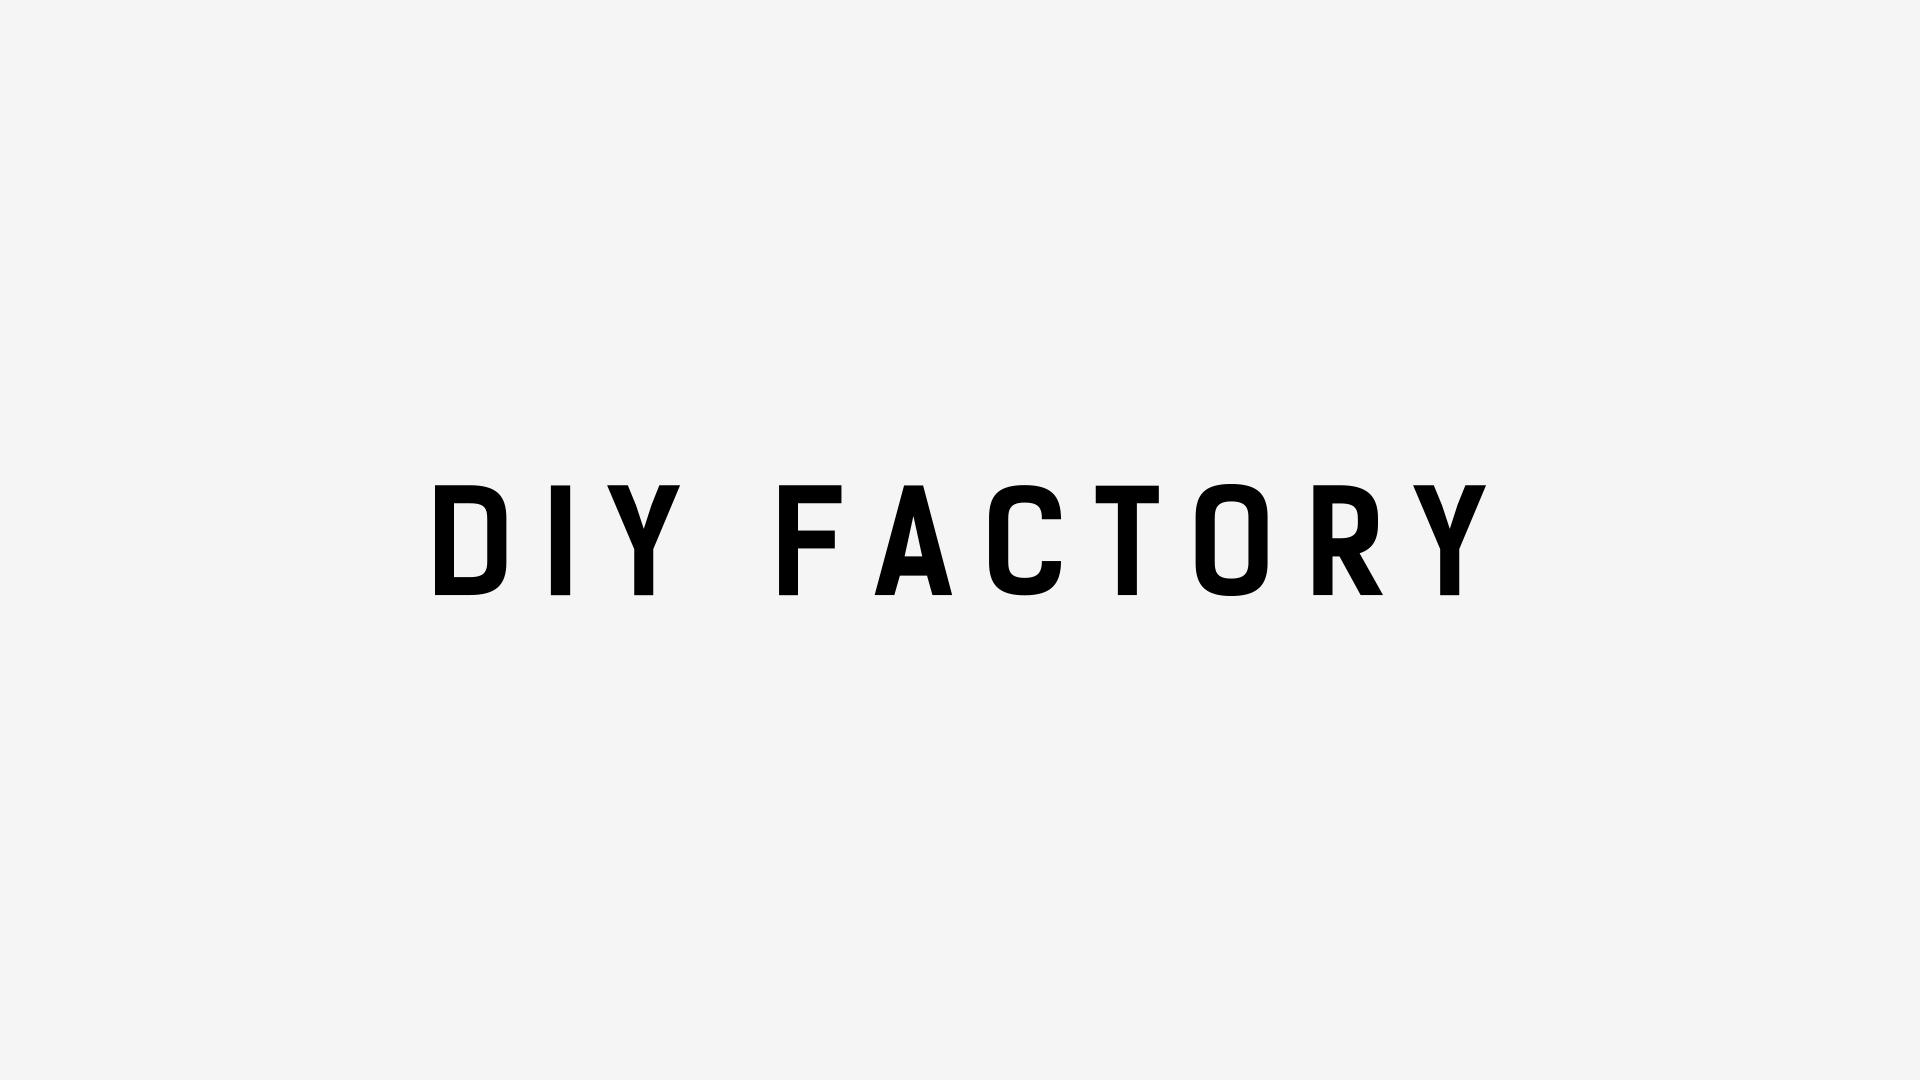 DIY FACTORYロゴデザイン